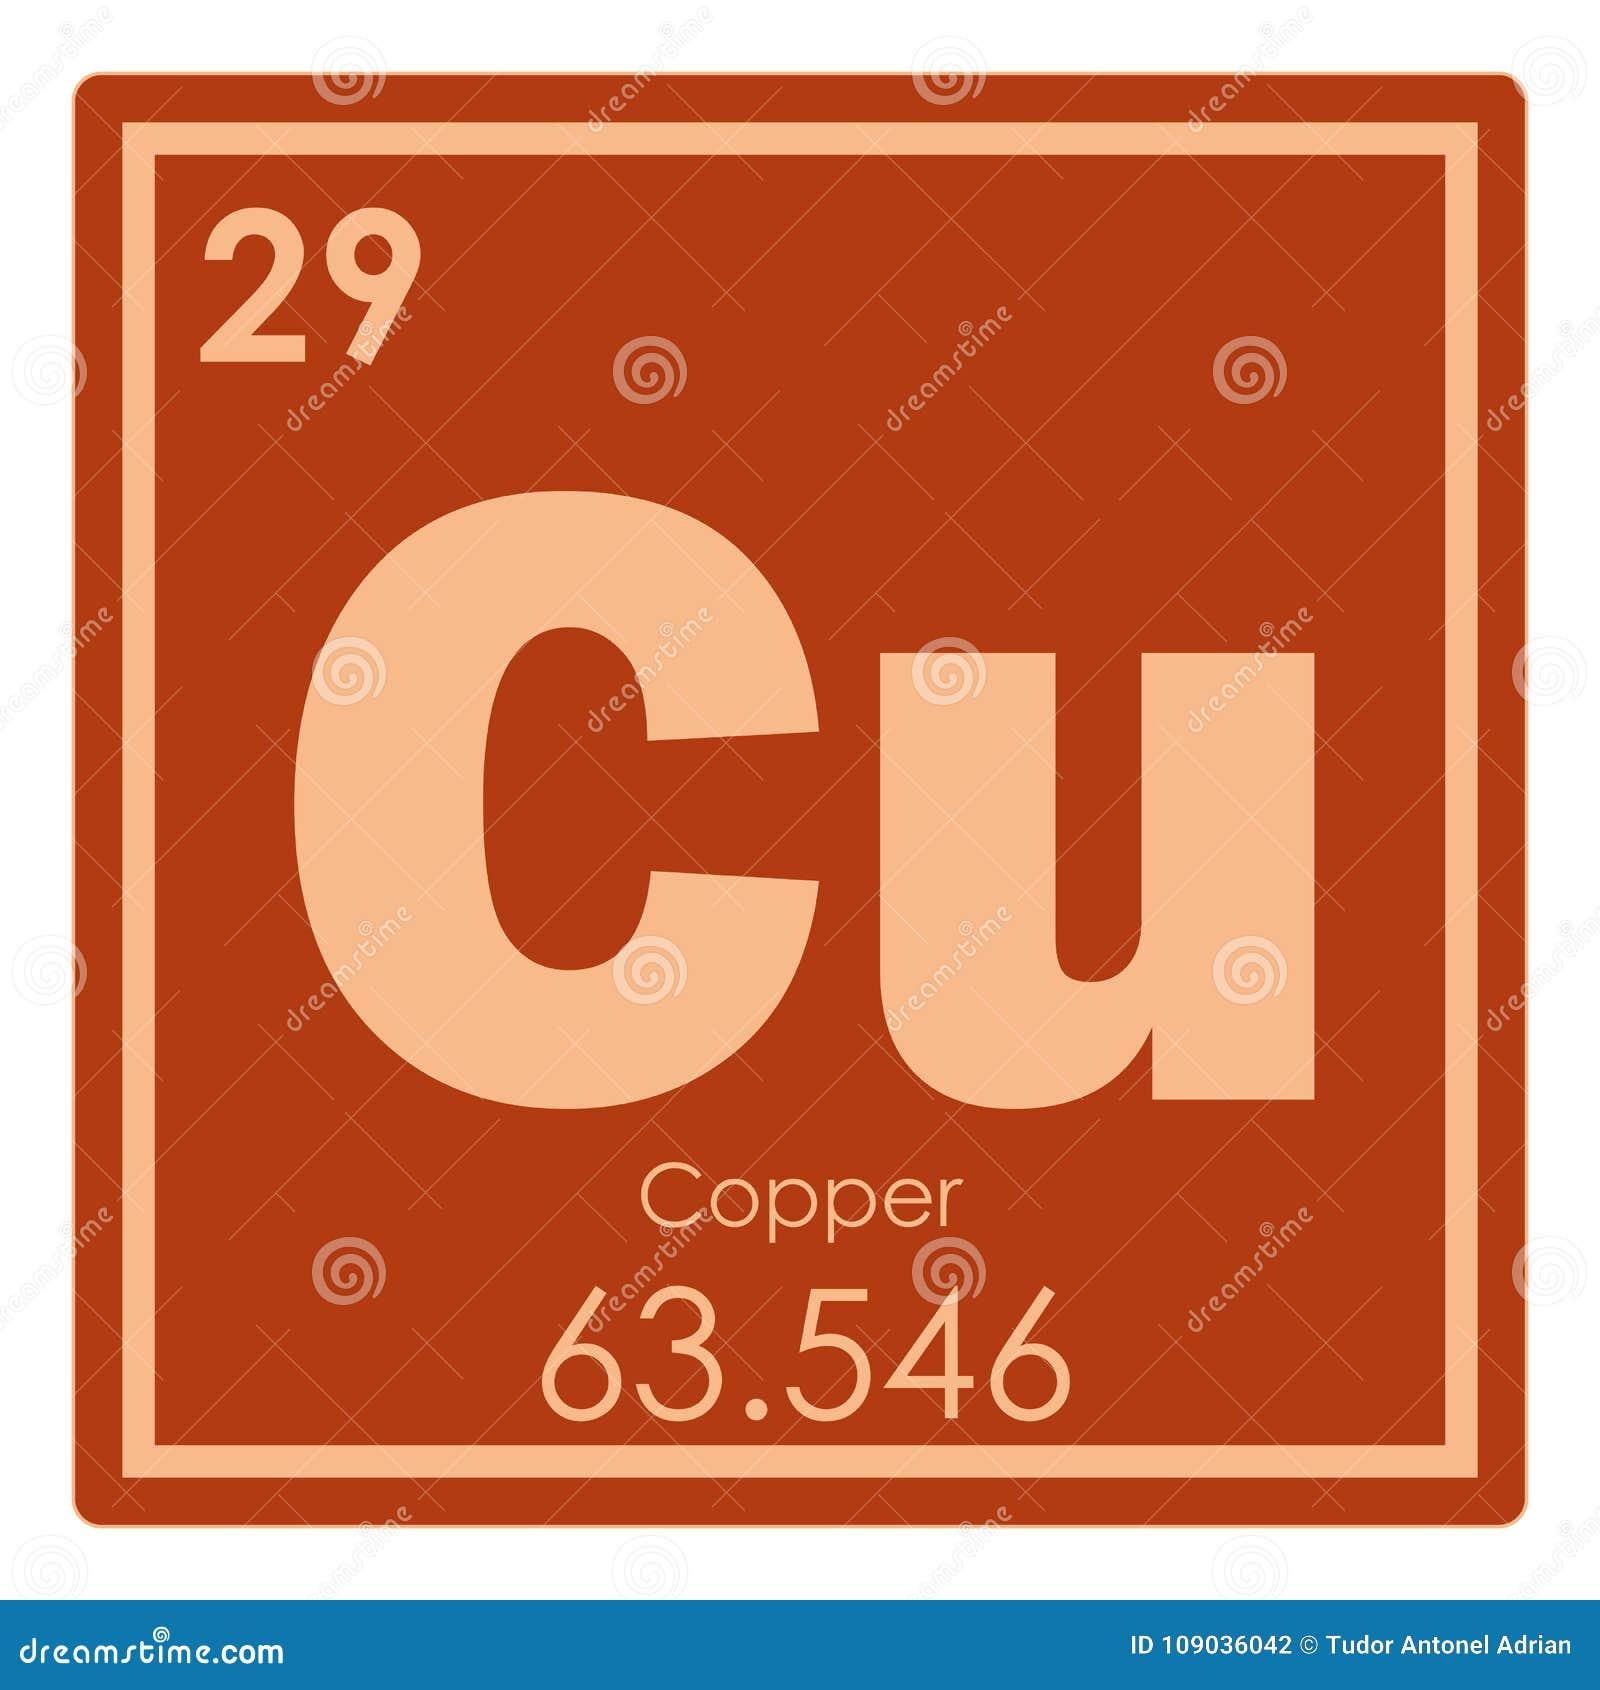 Copper Chemical Element Stock Illustration Illustration Of Periodic